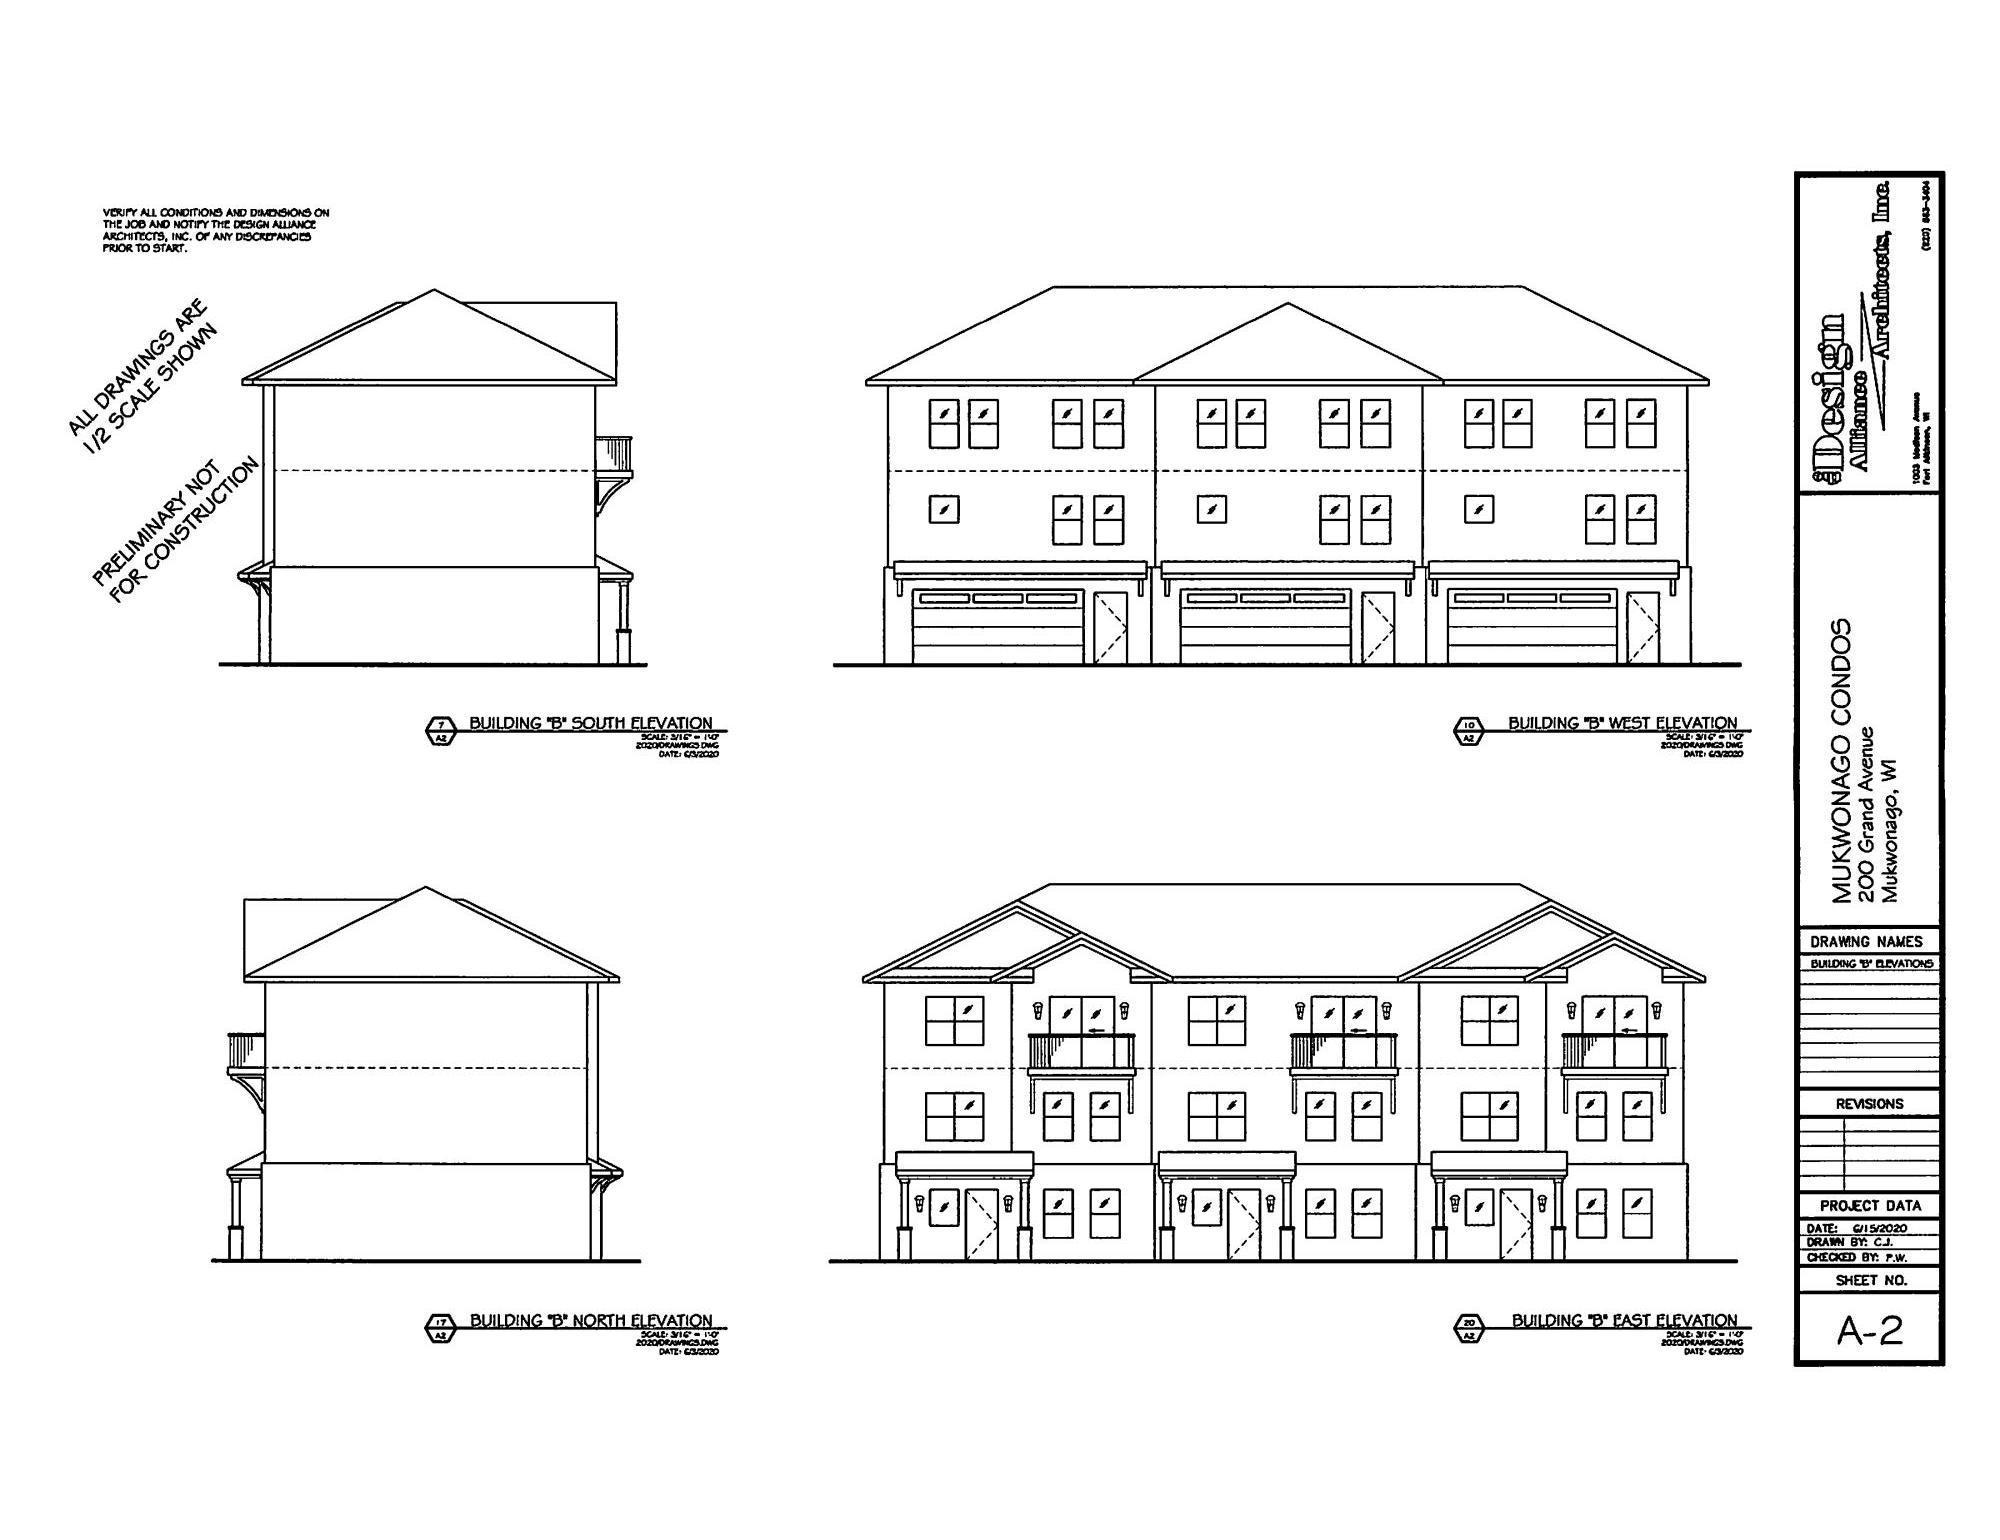 200 Grand Ave, Mukwonago, Wisconsin 53149, 2 Bedrooms Bedrooms, ,2 BathroomsBathrooms,Condominium,For Sale,Grand Ave,1695815